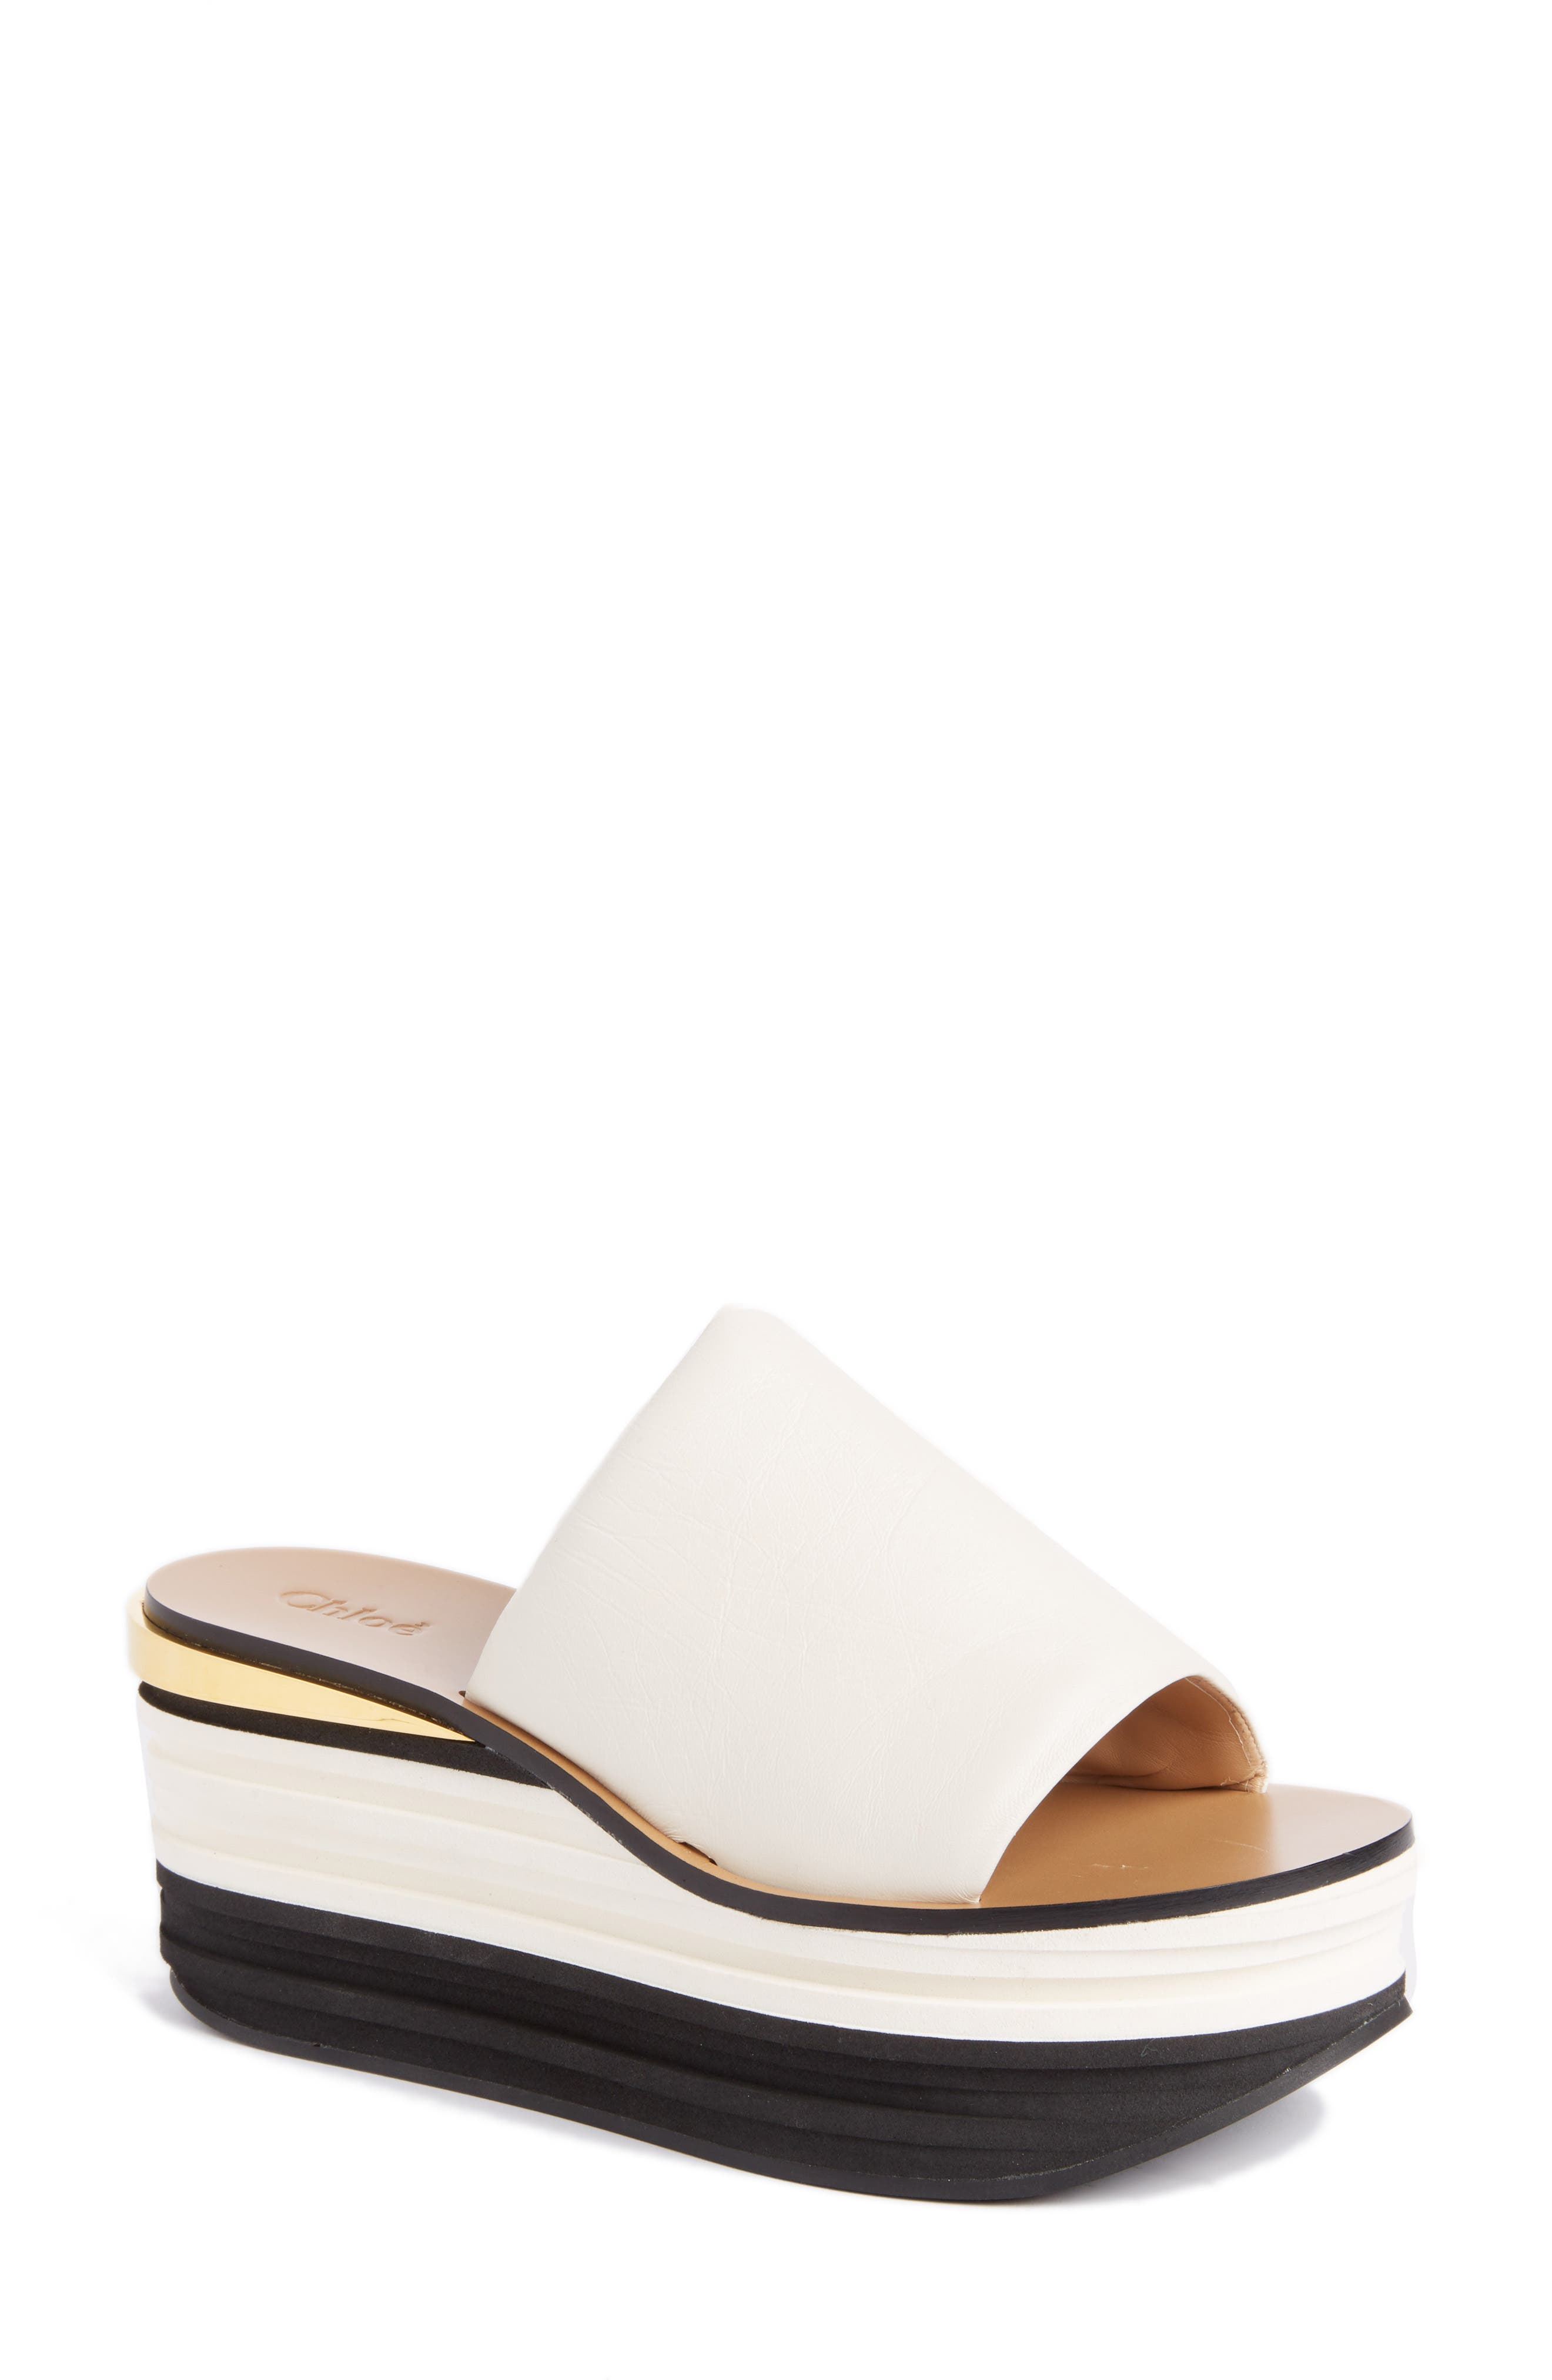 Chloé Camille Platform Sandal (Women)